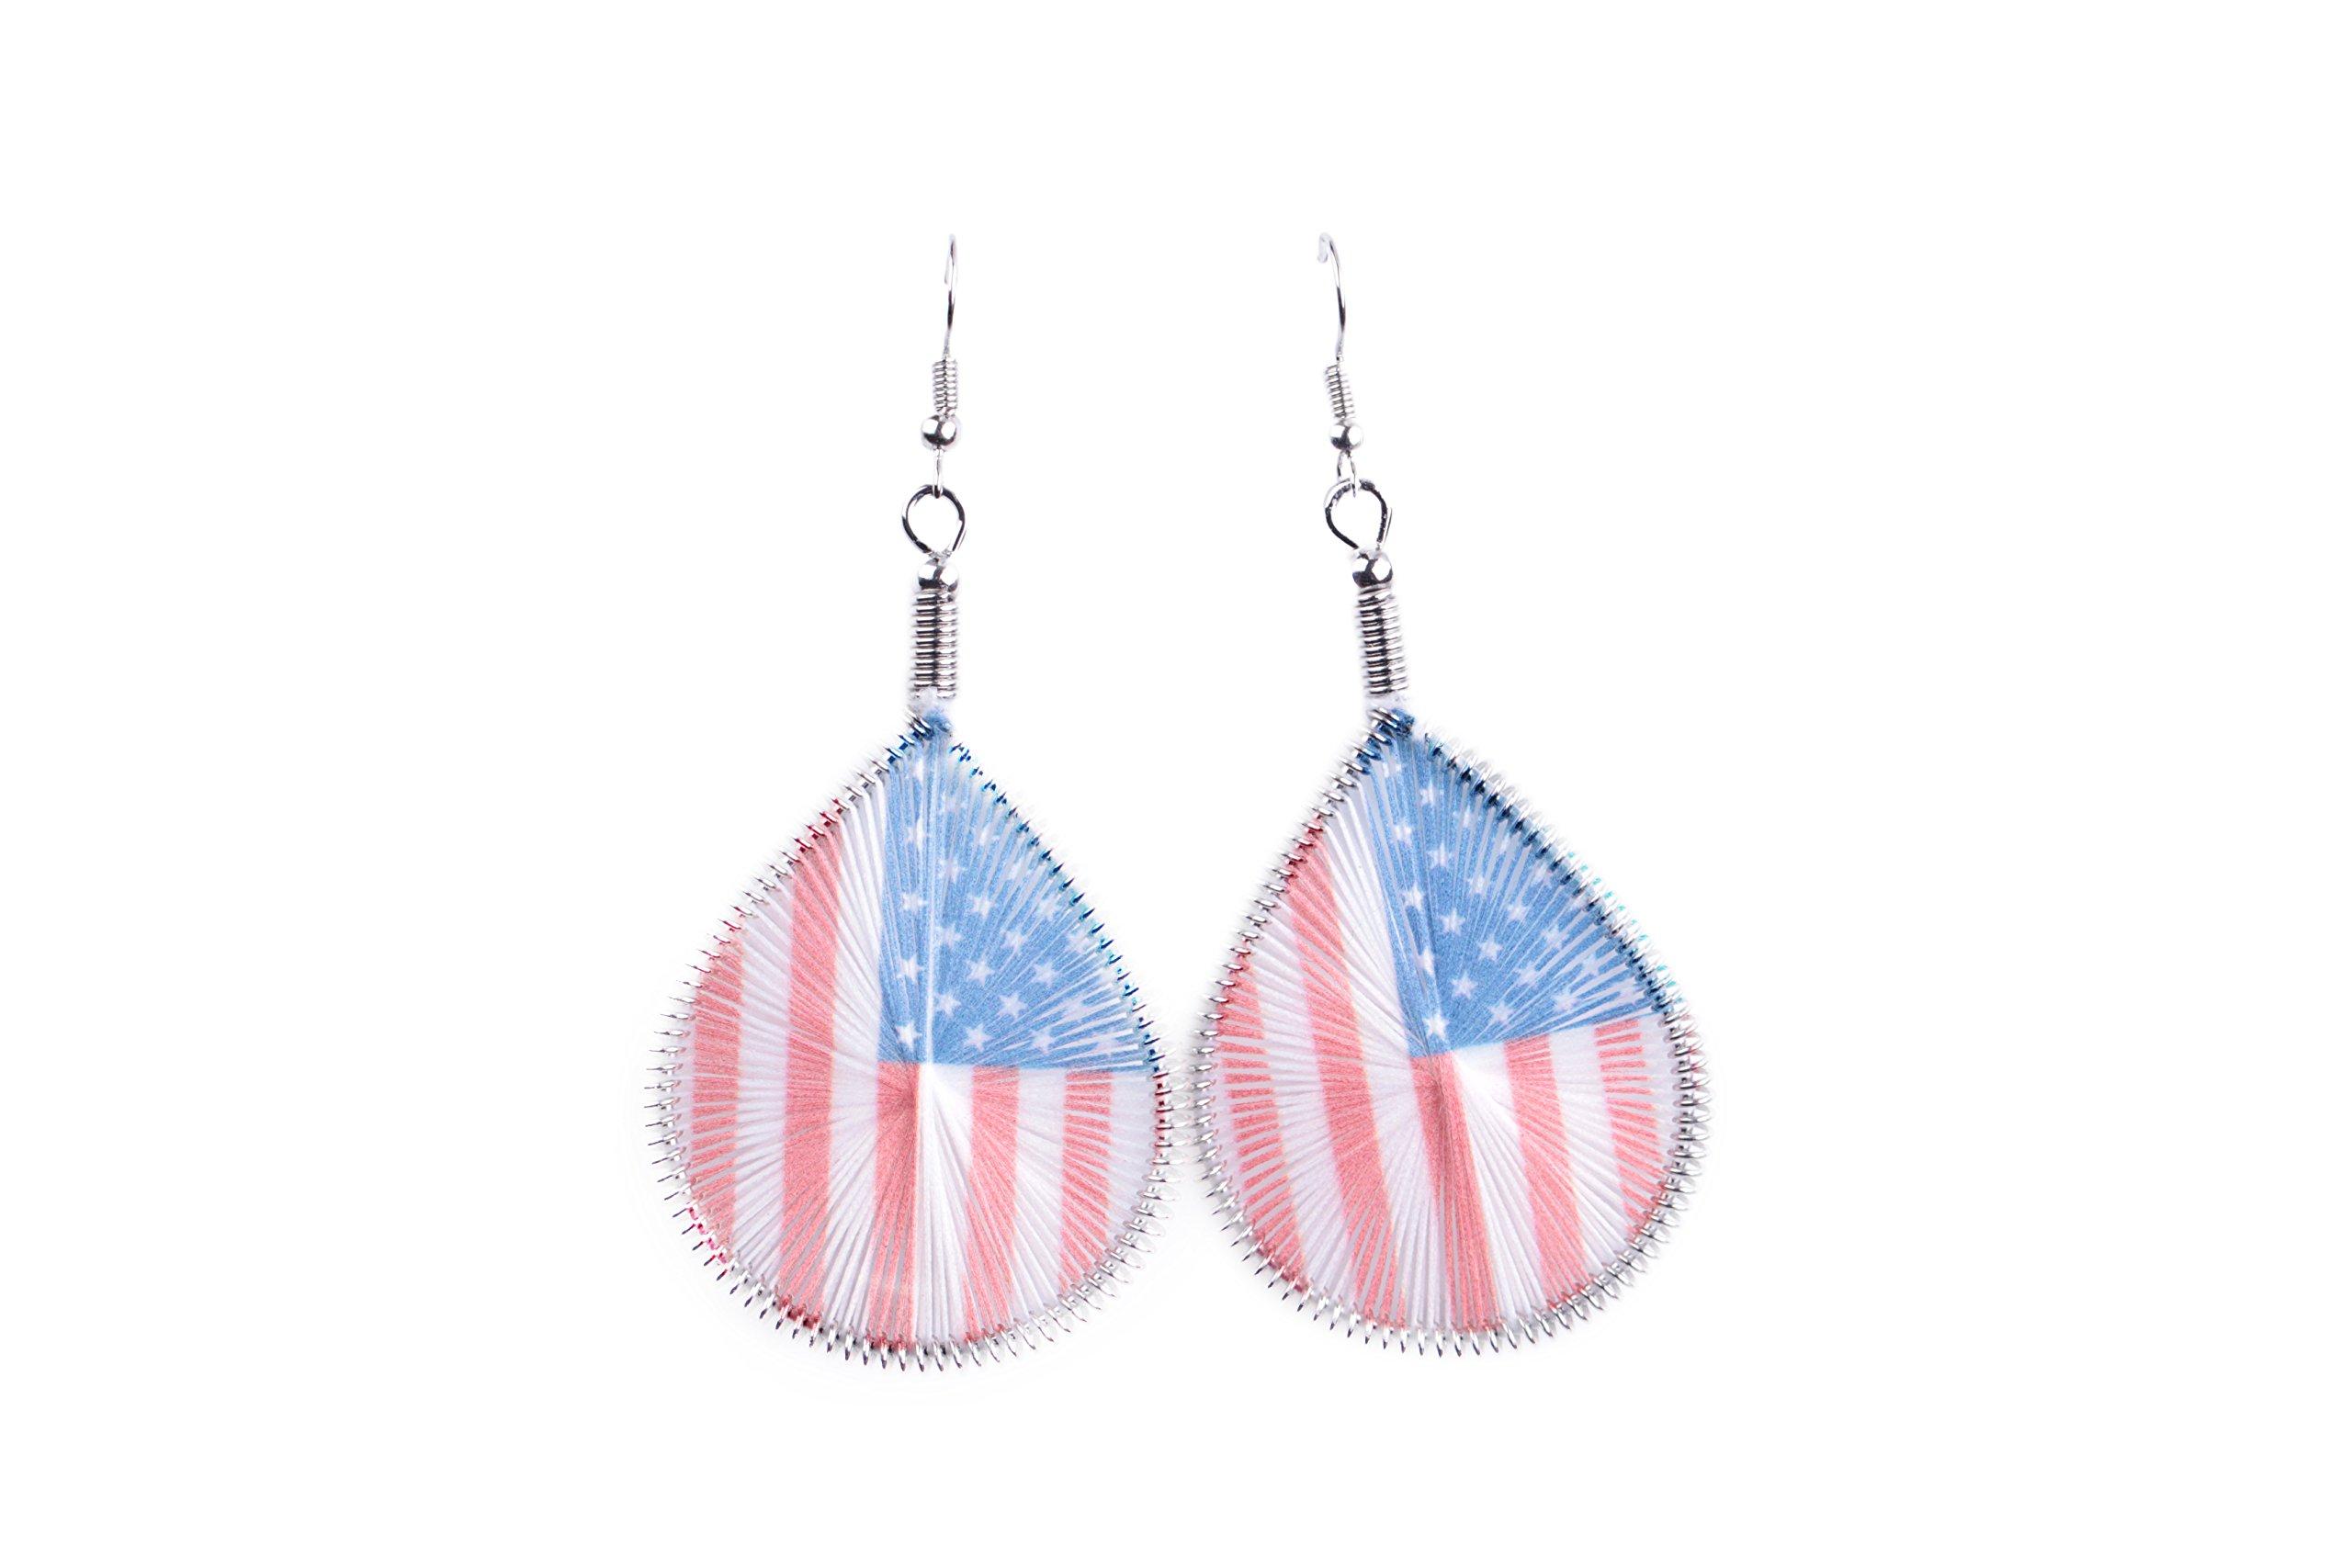 Luvalti Patriotic American USA Flag - Woven Thread Teardrop Earrings - Jewelry Gift